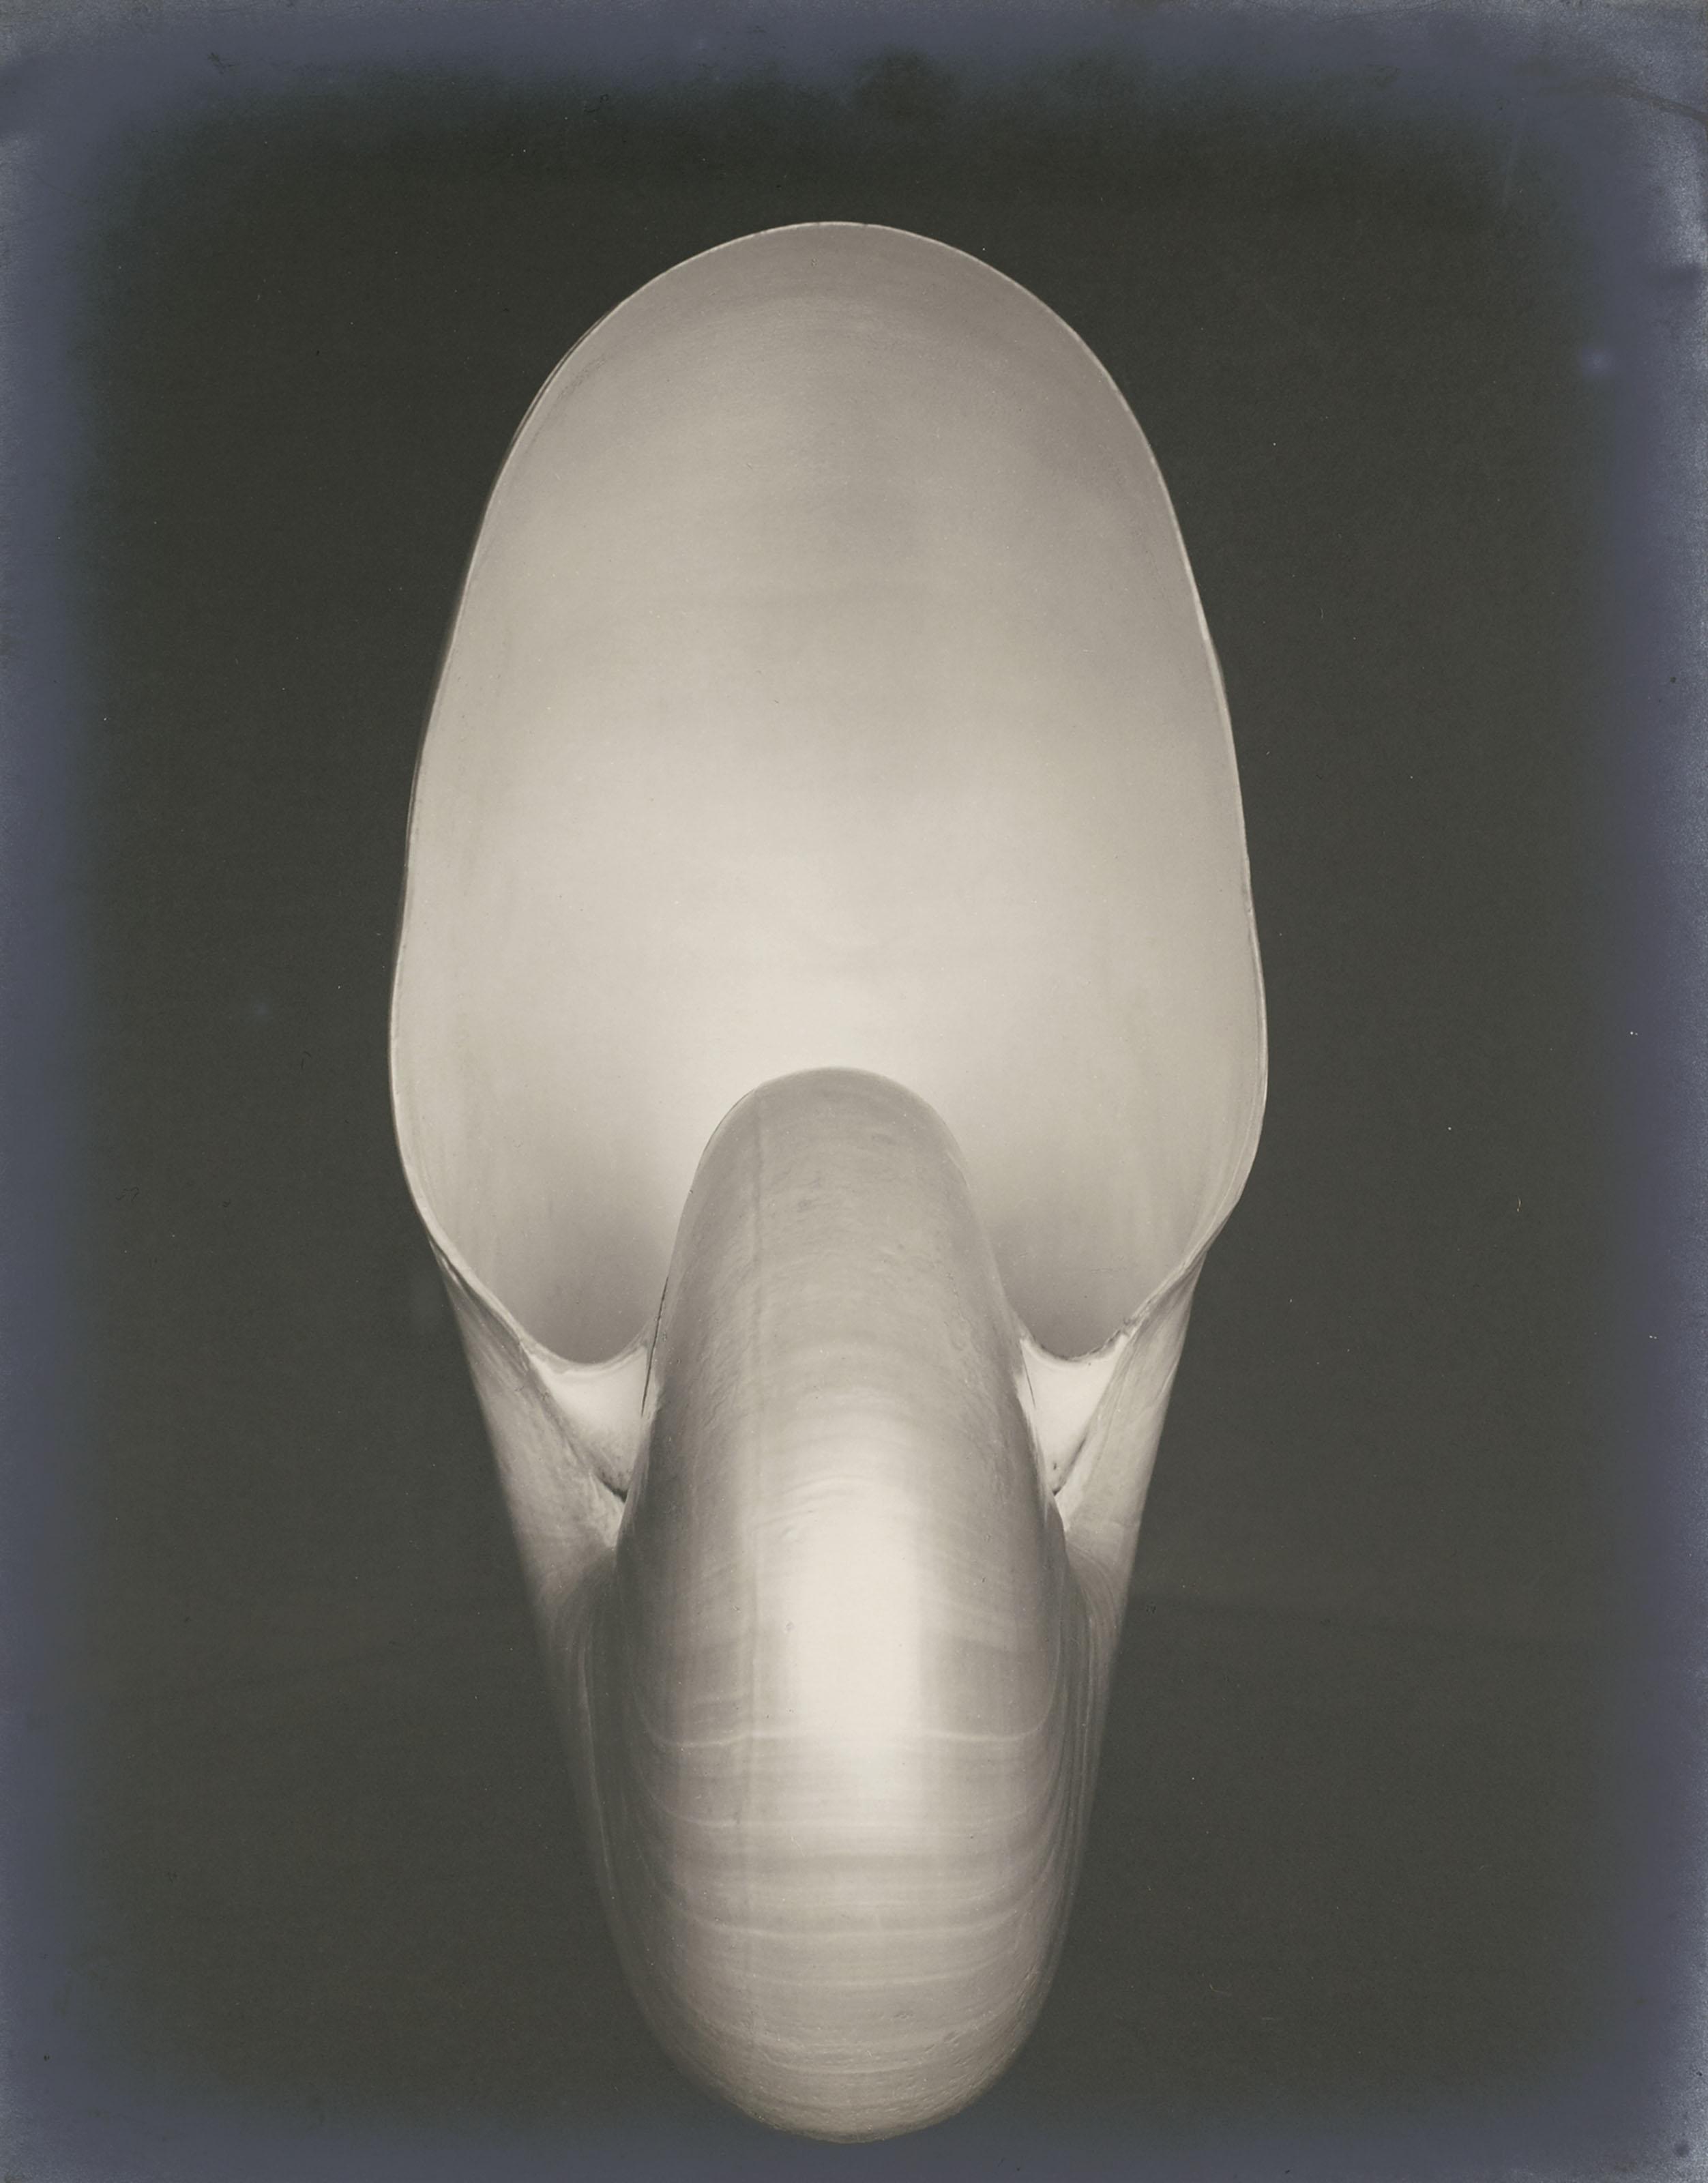 Shell (Nautilus)